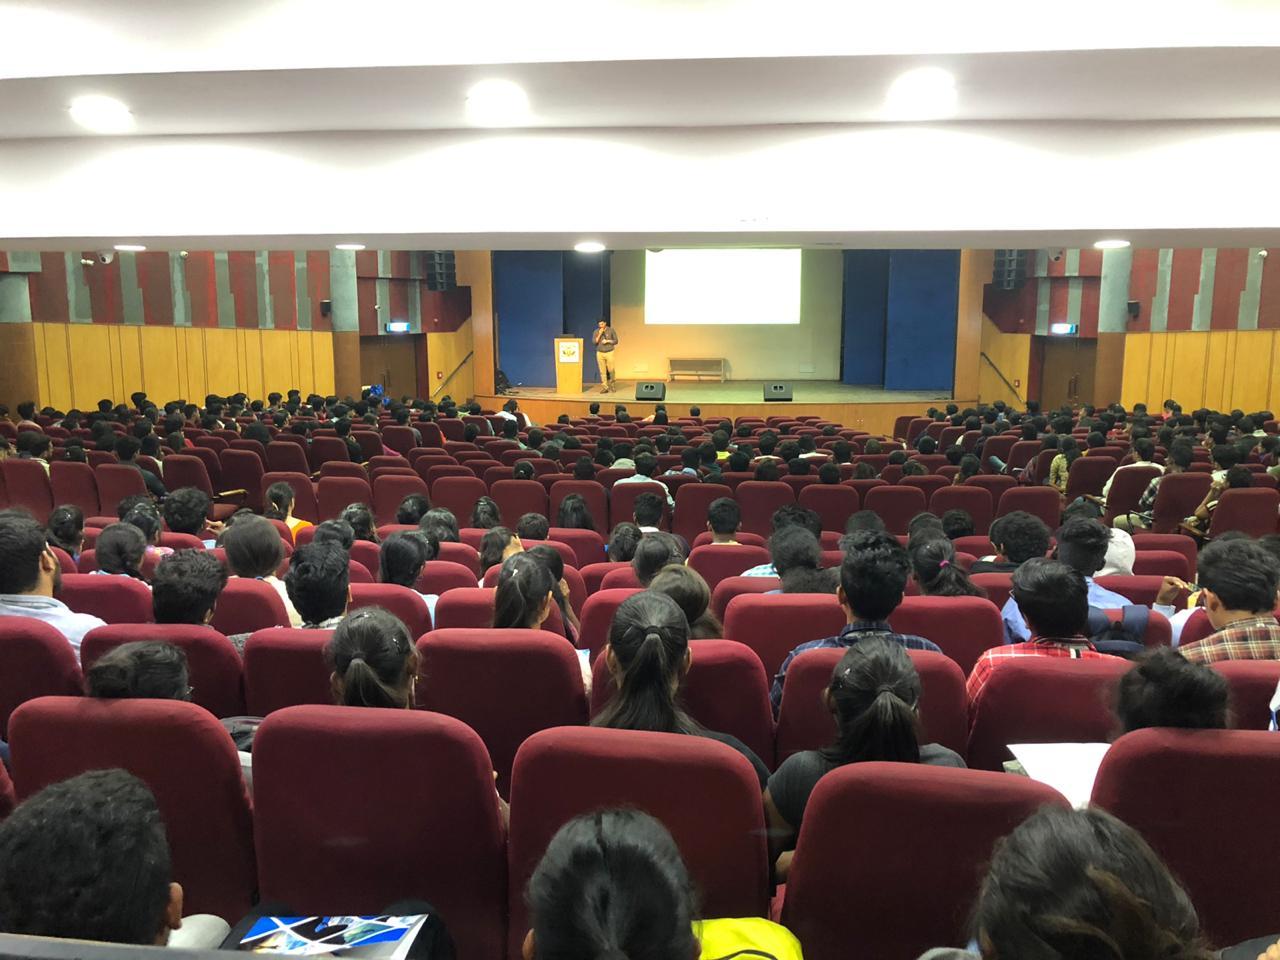 Workshop at St. Joseph's College